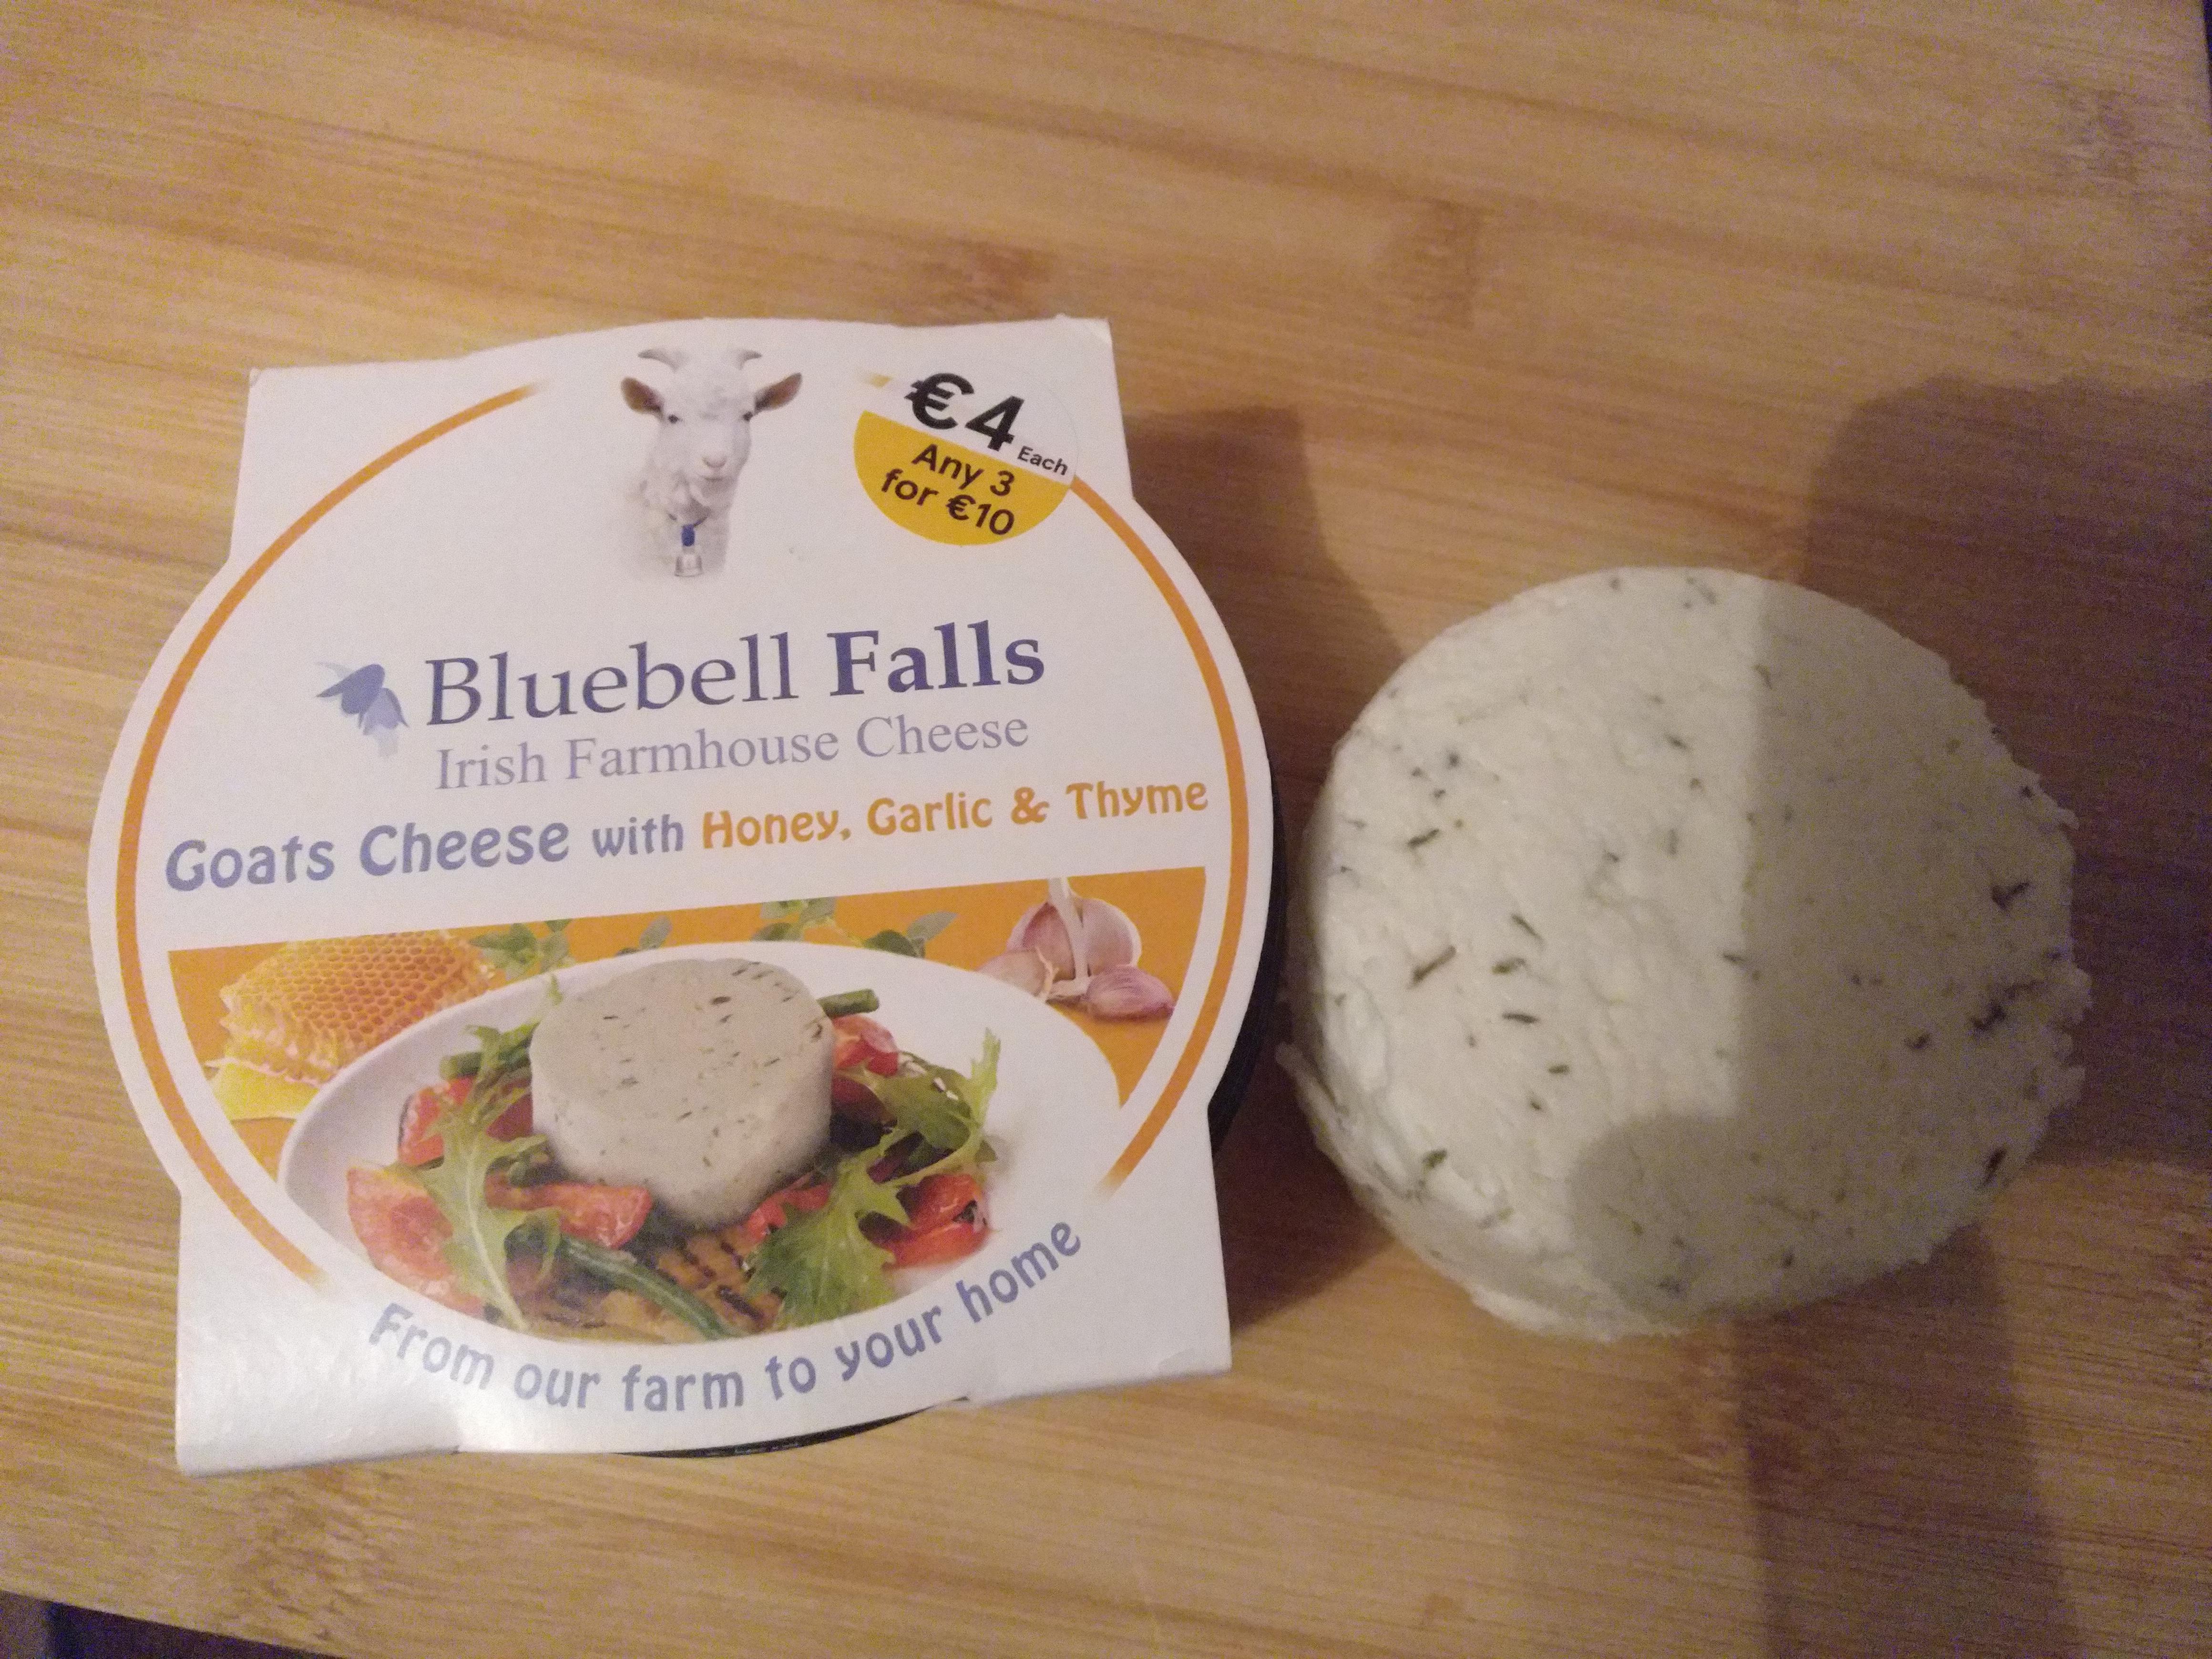 Bluebell Falls Goats Cheese - Honey, Garlic, Thyme